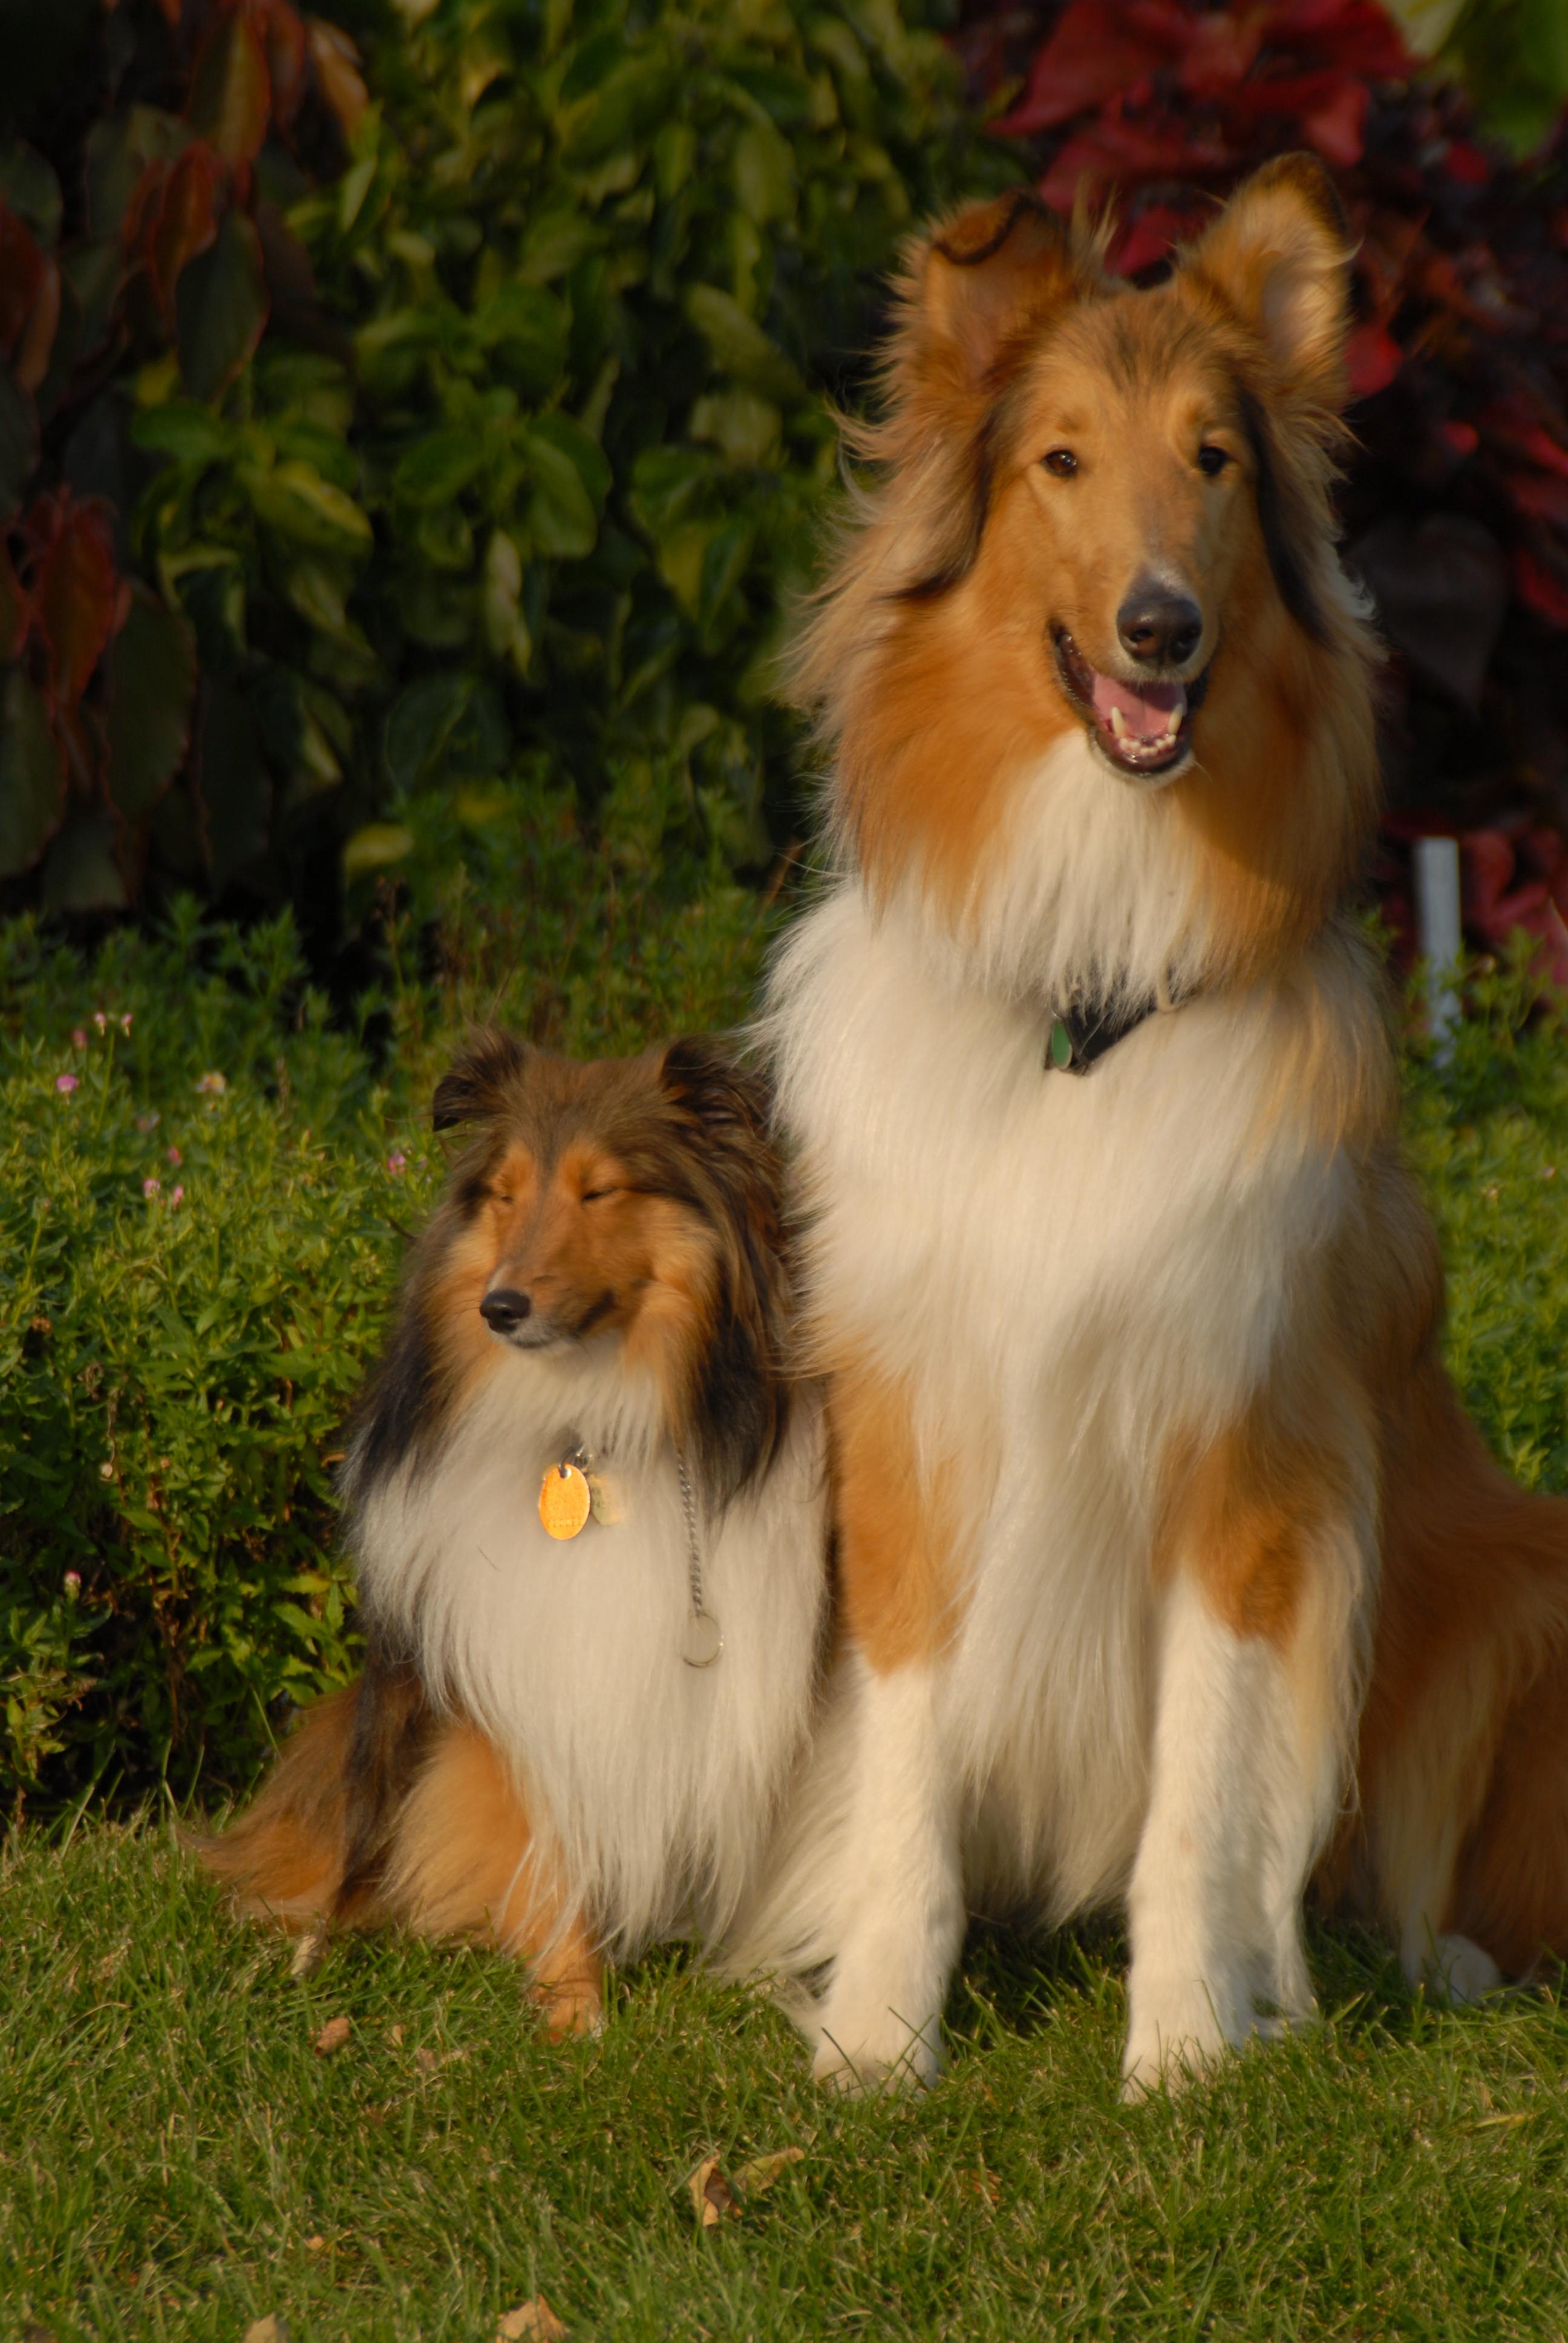 Rethinking the origins of the Shetland sheepdog | Canis lupus hominis